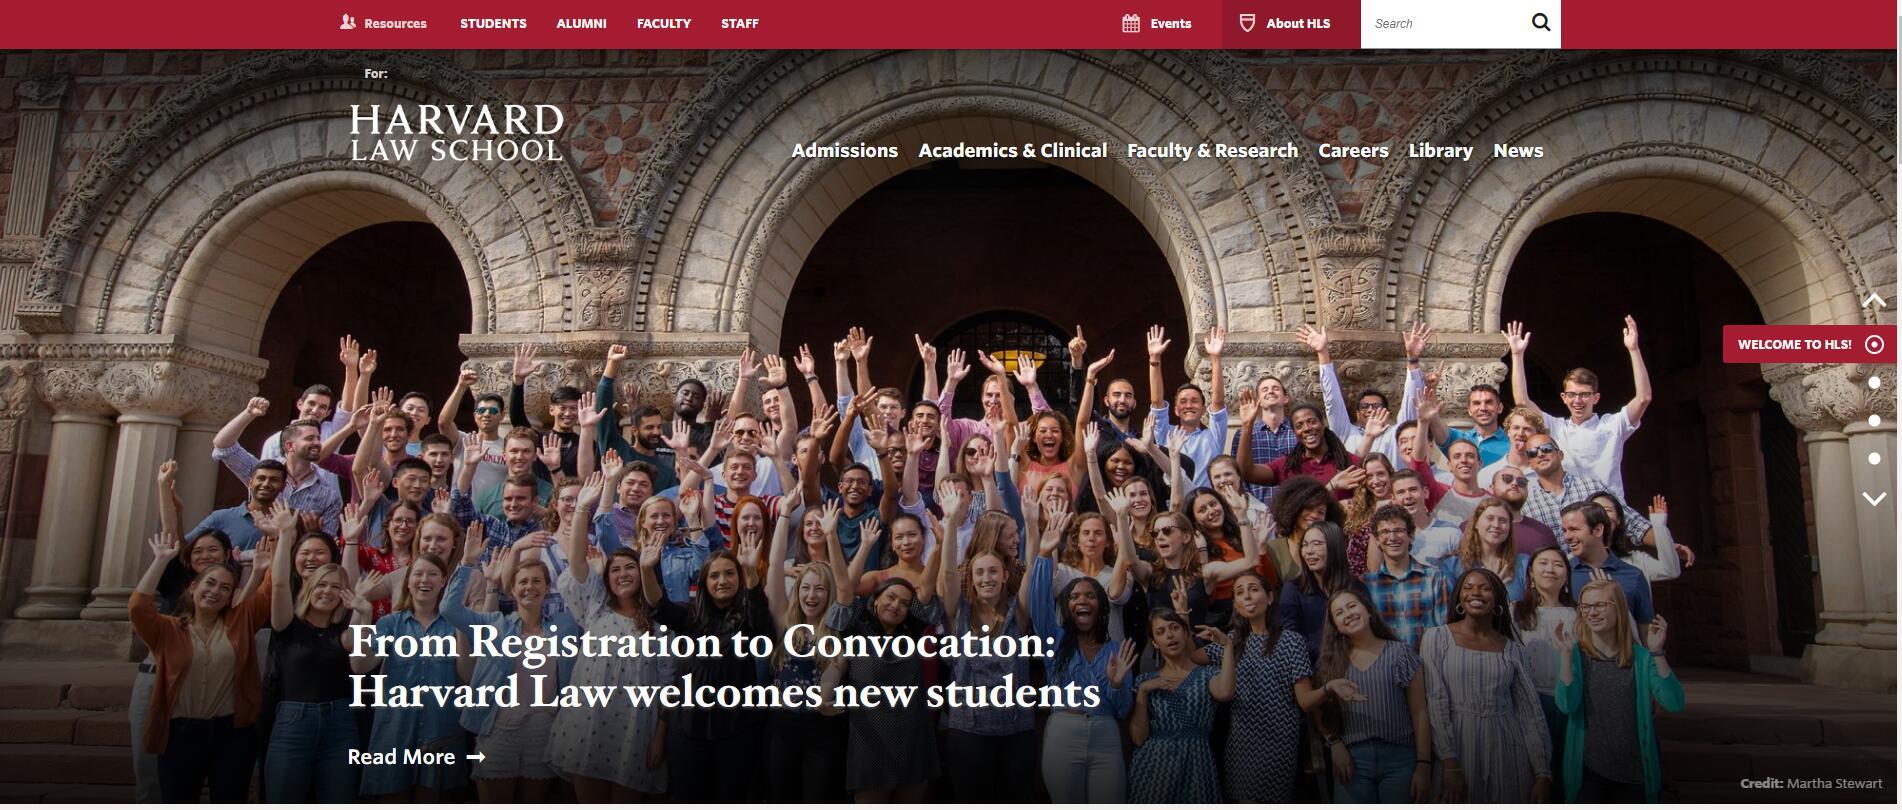 The Law School at Harvard University